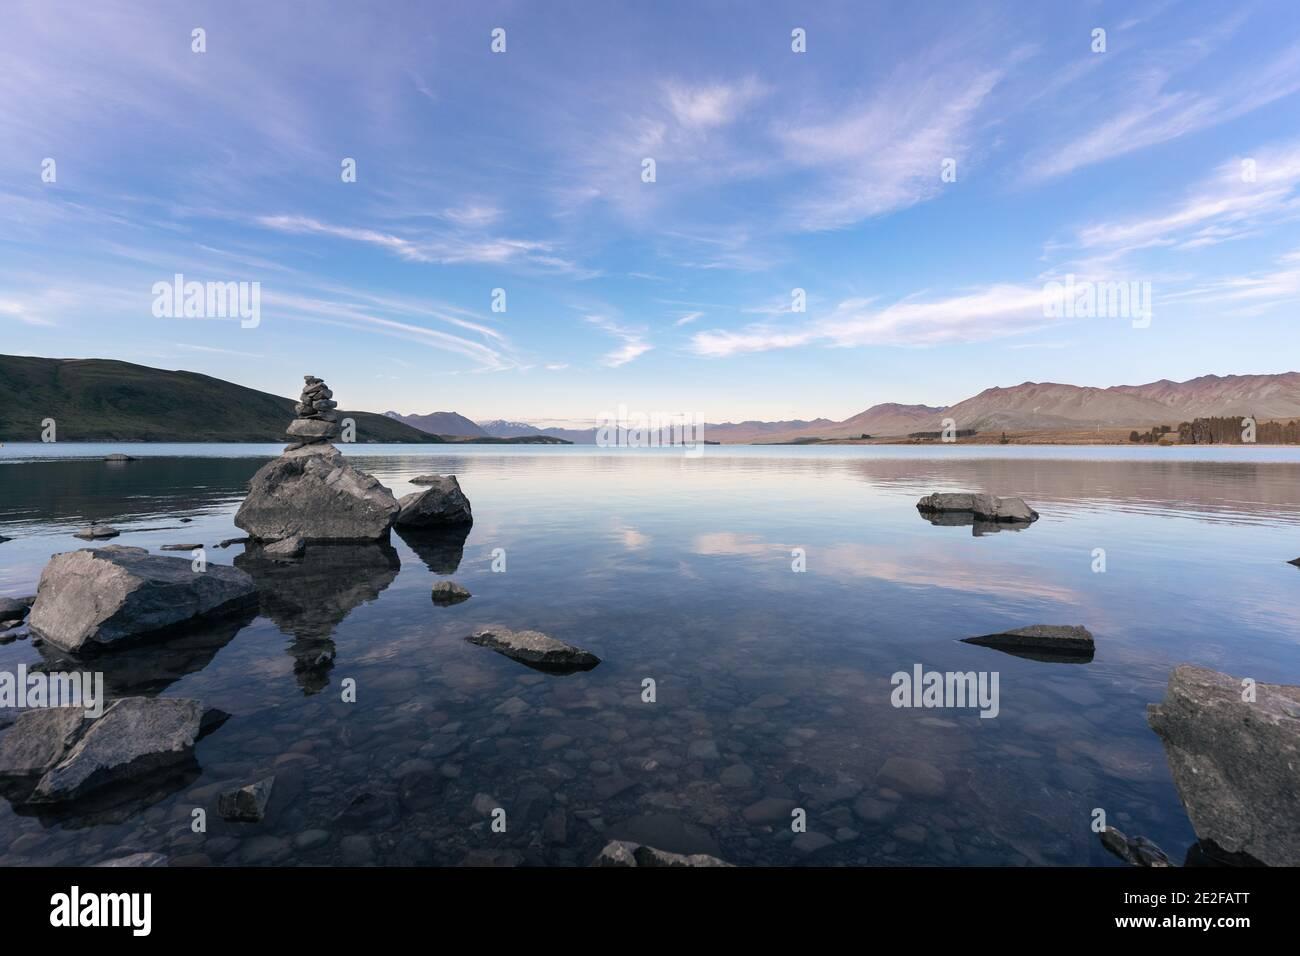 Peaceful landscape of Lake Tekapo in the South Island of New Zealand. Canterbury Region Stock Photo